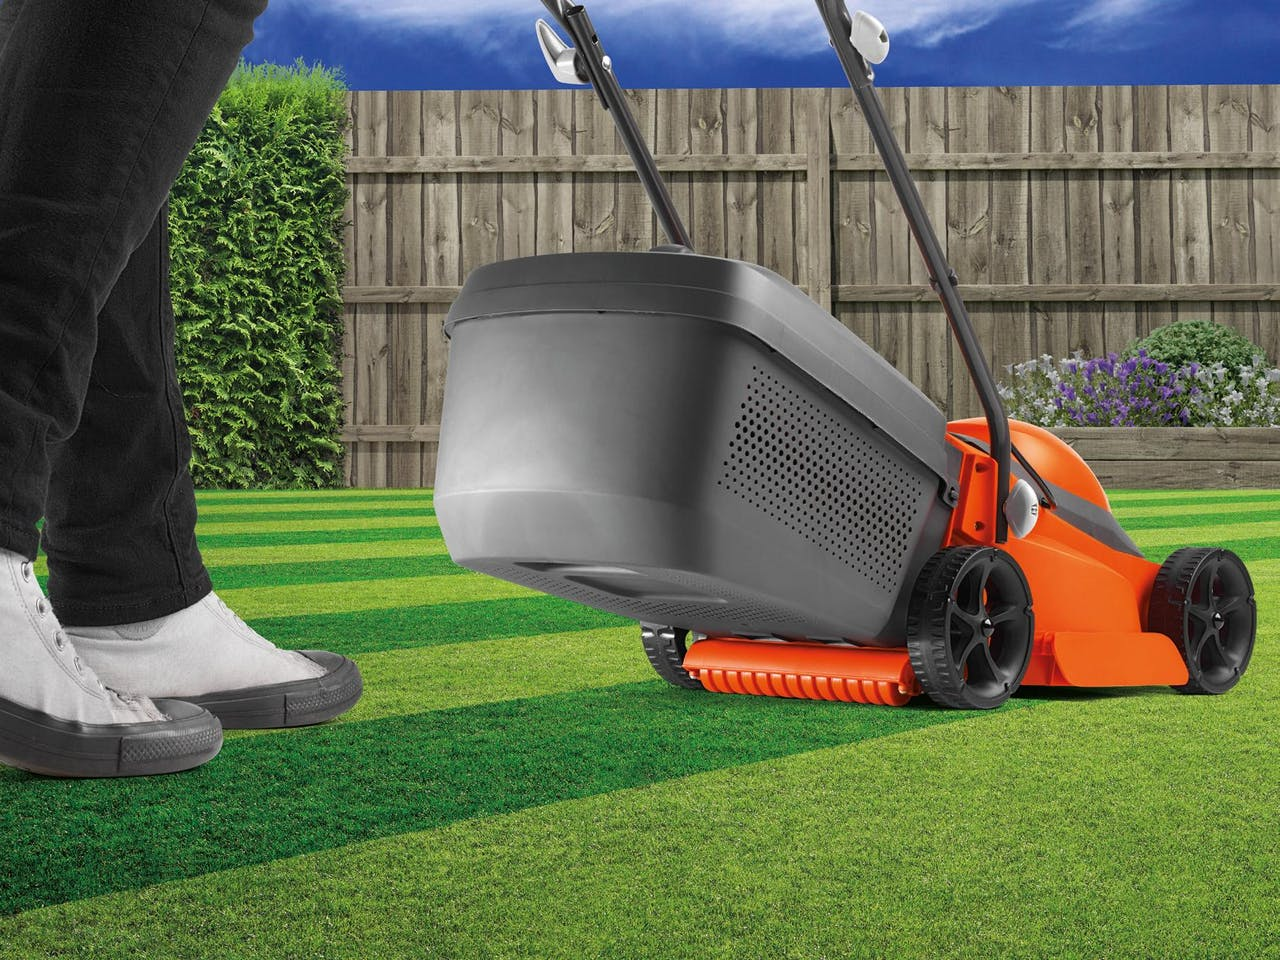 Flymo Rotary Lawn Mower